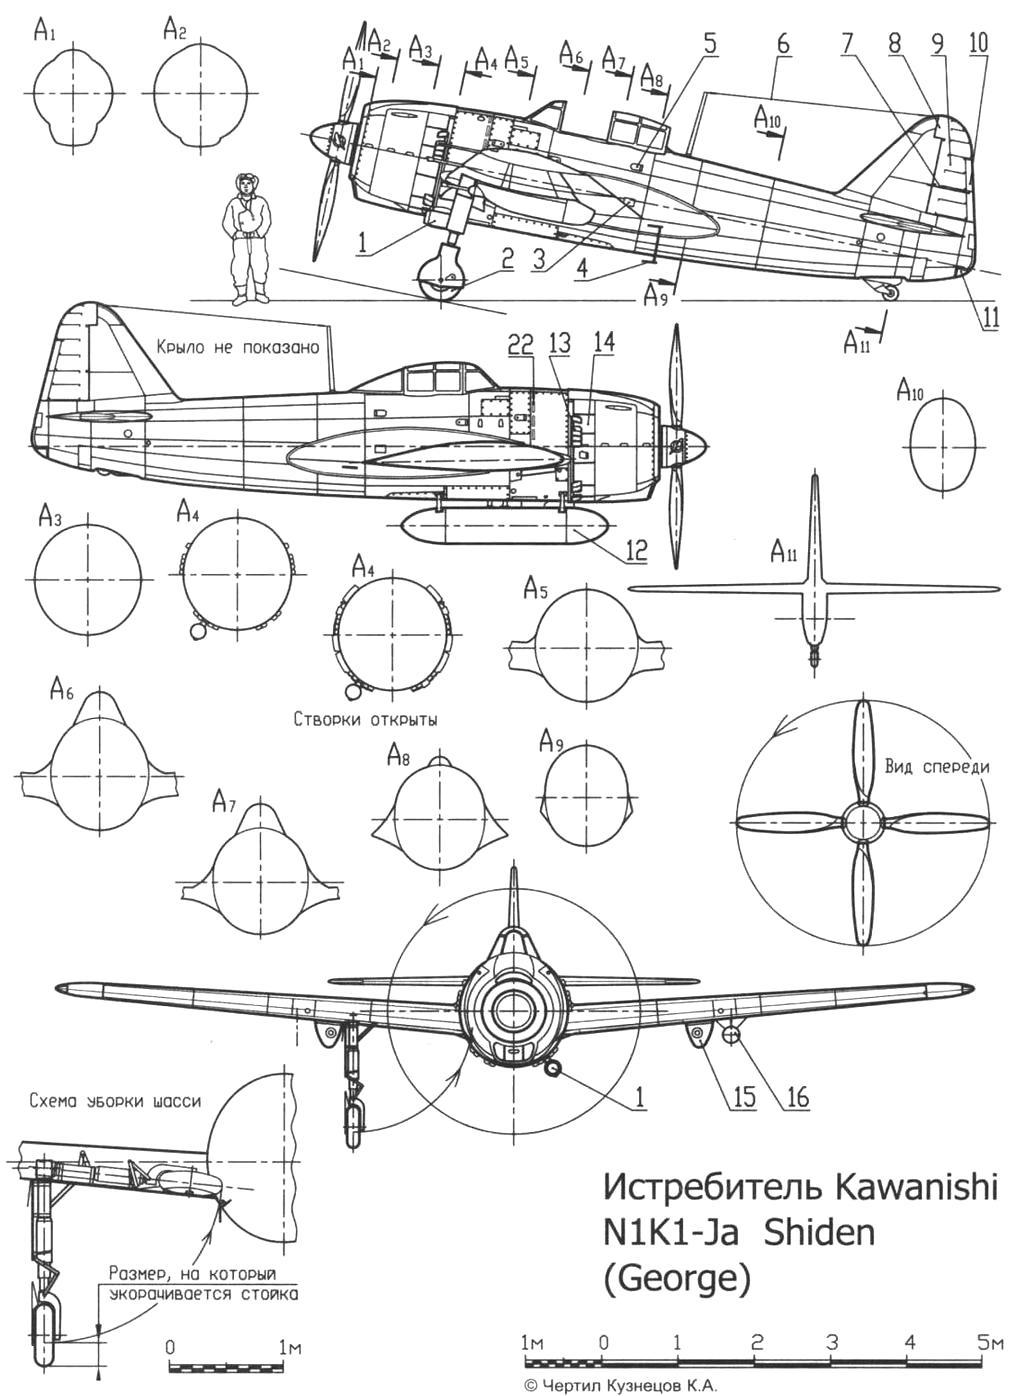 Истребитель Kawanishi N1K1-Ja Shiden (George)